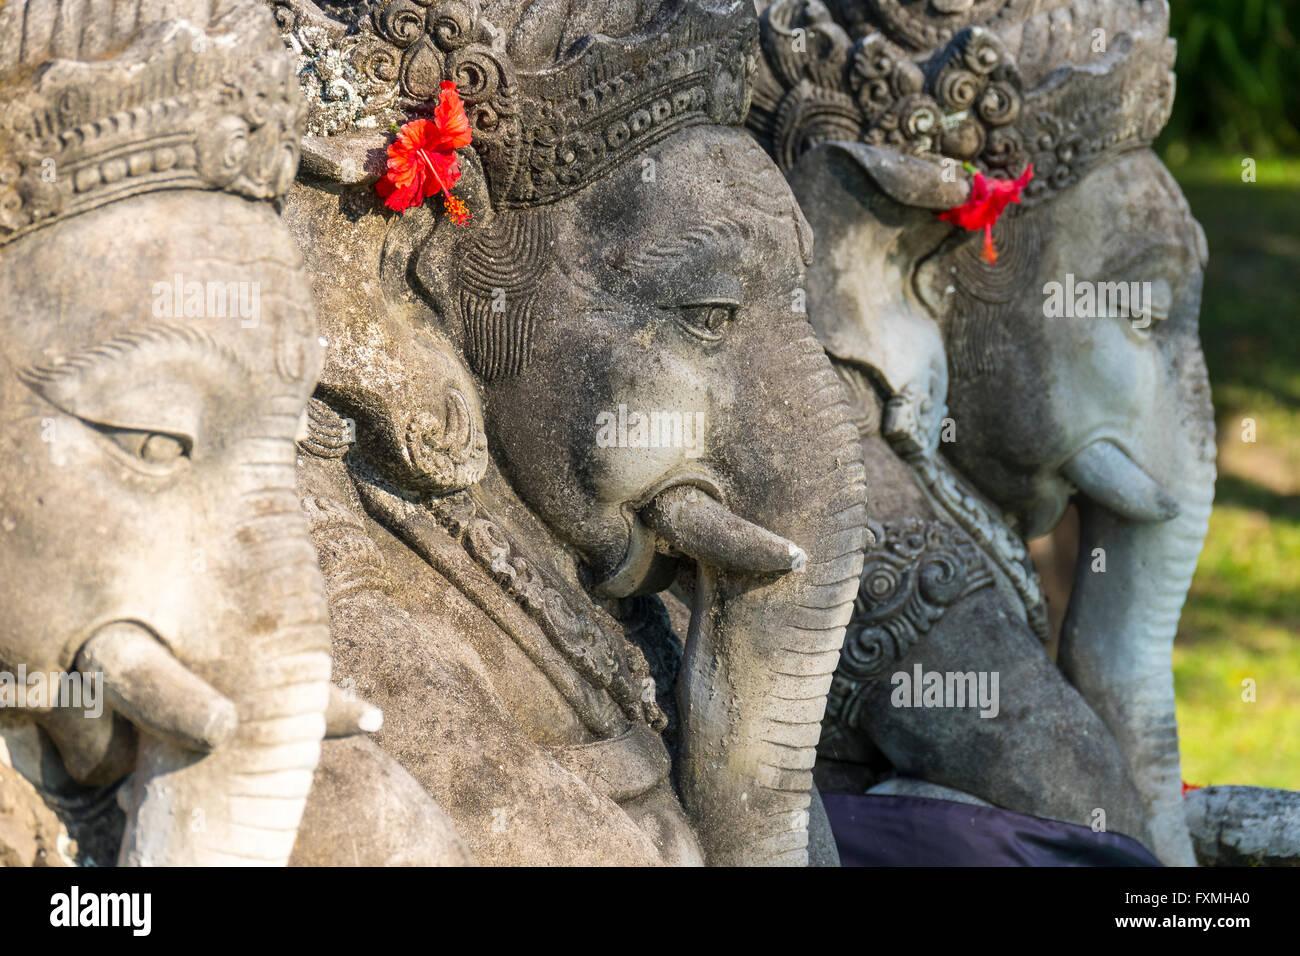 Elephant Sculpture, Ubud, Bali, Indonesia - Stock Image